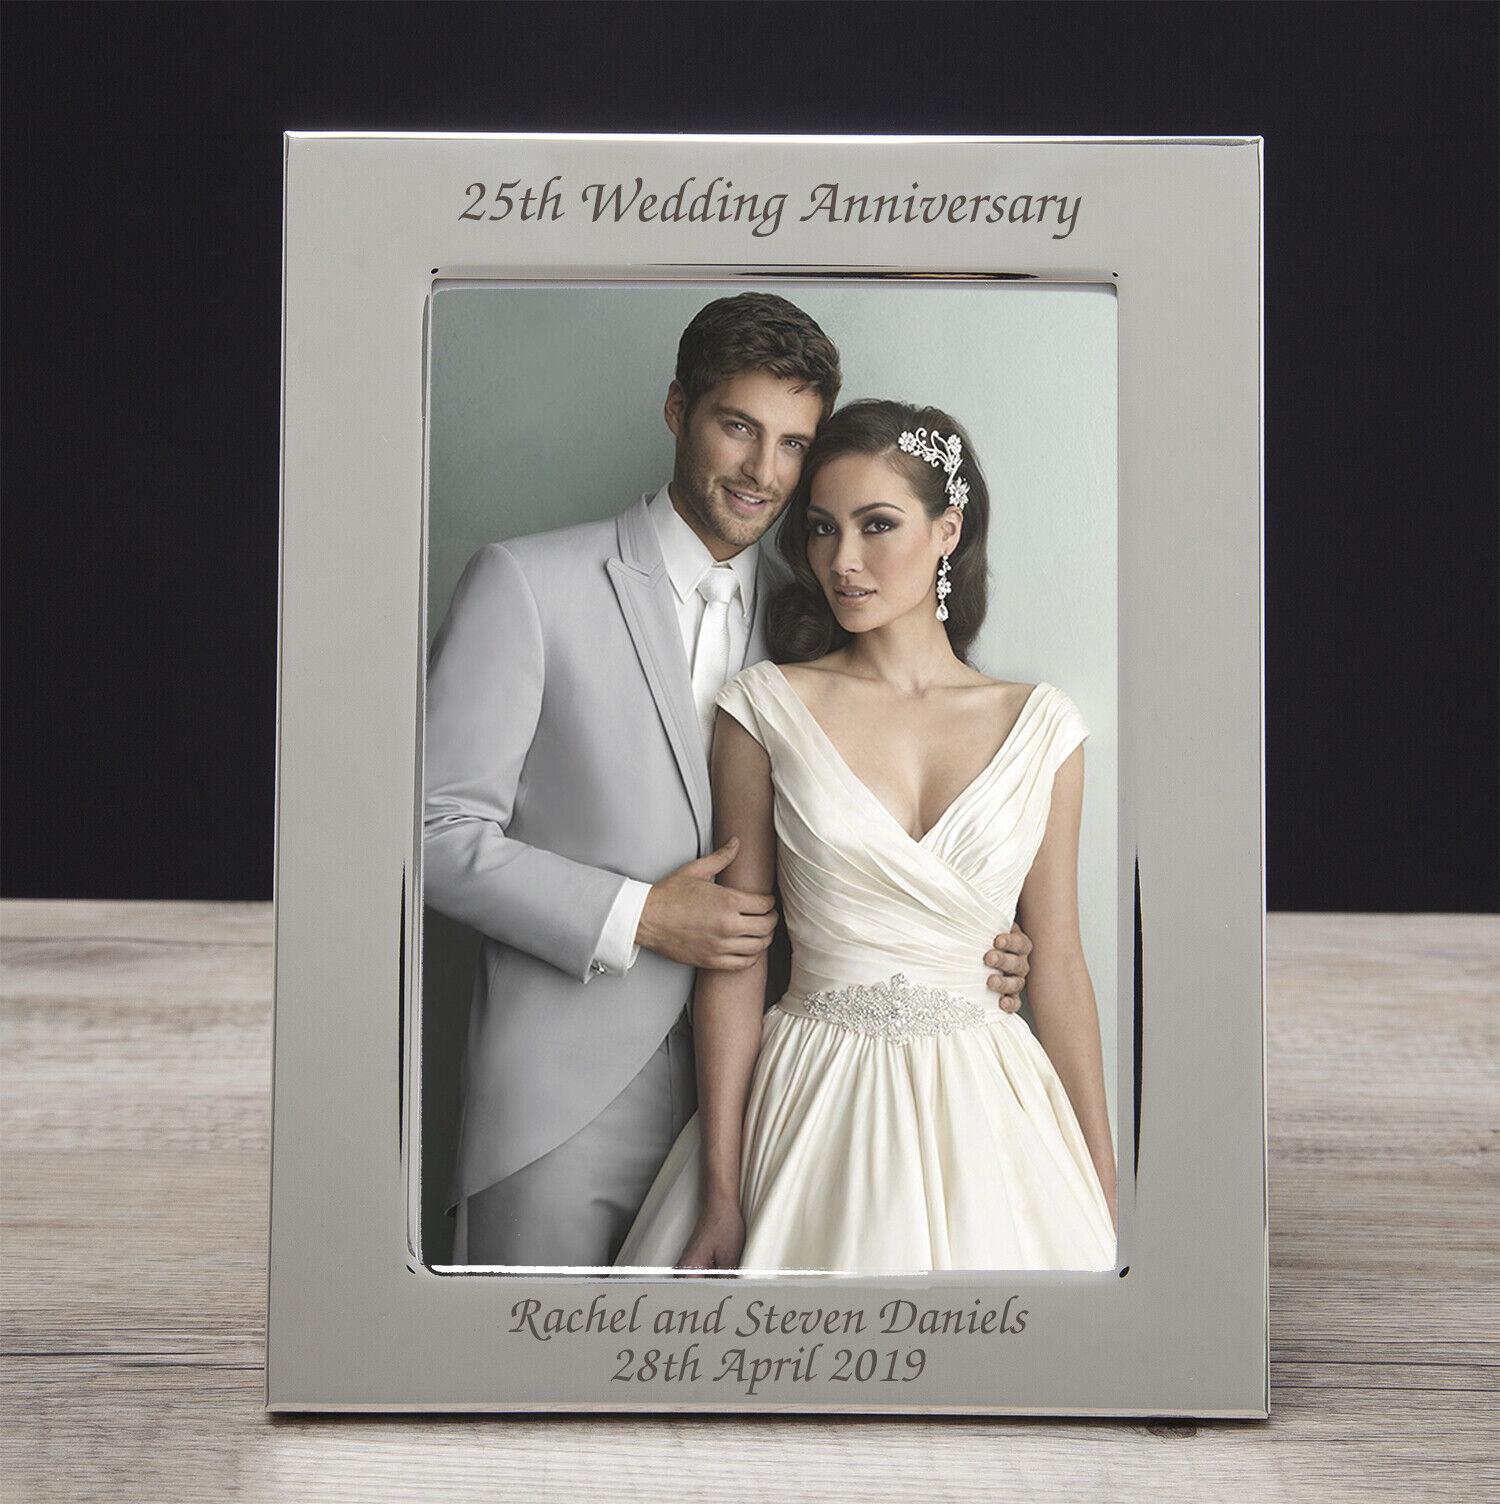 Personalised Engraved Wedding Anniversary Photo Frames Silver Ruby Diamond Gold Ebay